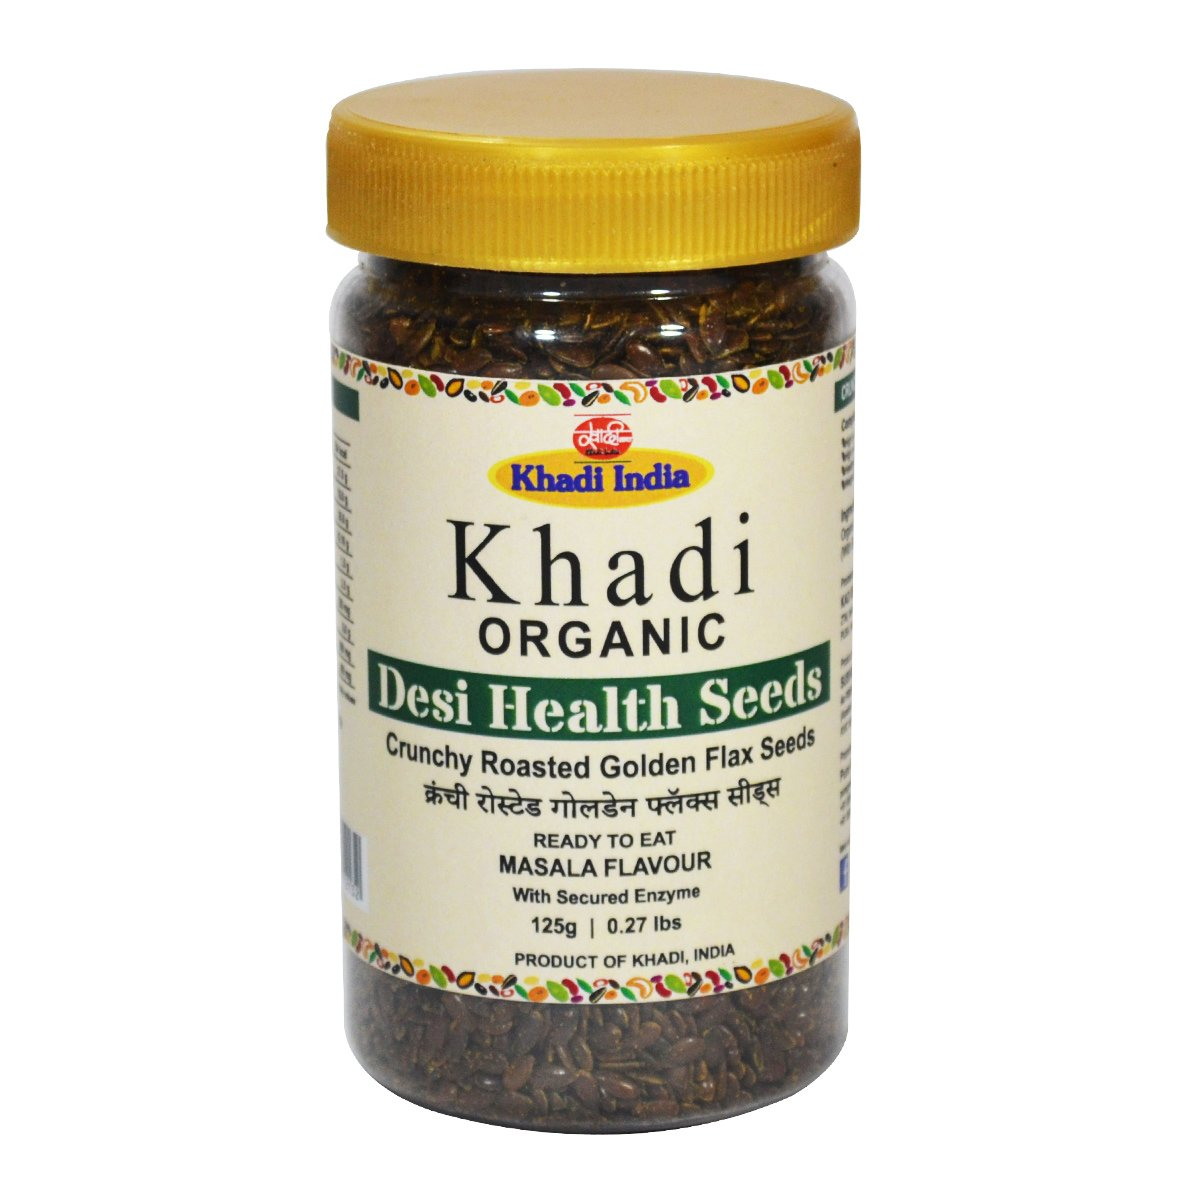 Khadi Organic Roasted Crunchy Golden Masala Flax Seeds 125 GM - 100% Natural, Gluten-Free, High-Fibre, Healthy Organic Food Rich in Proteins, Vitamins, Minerals